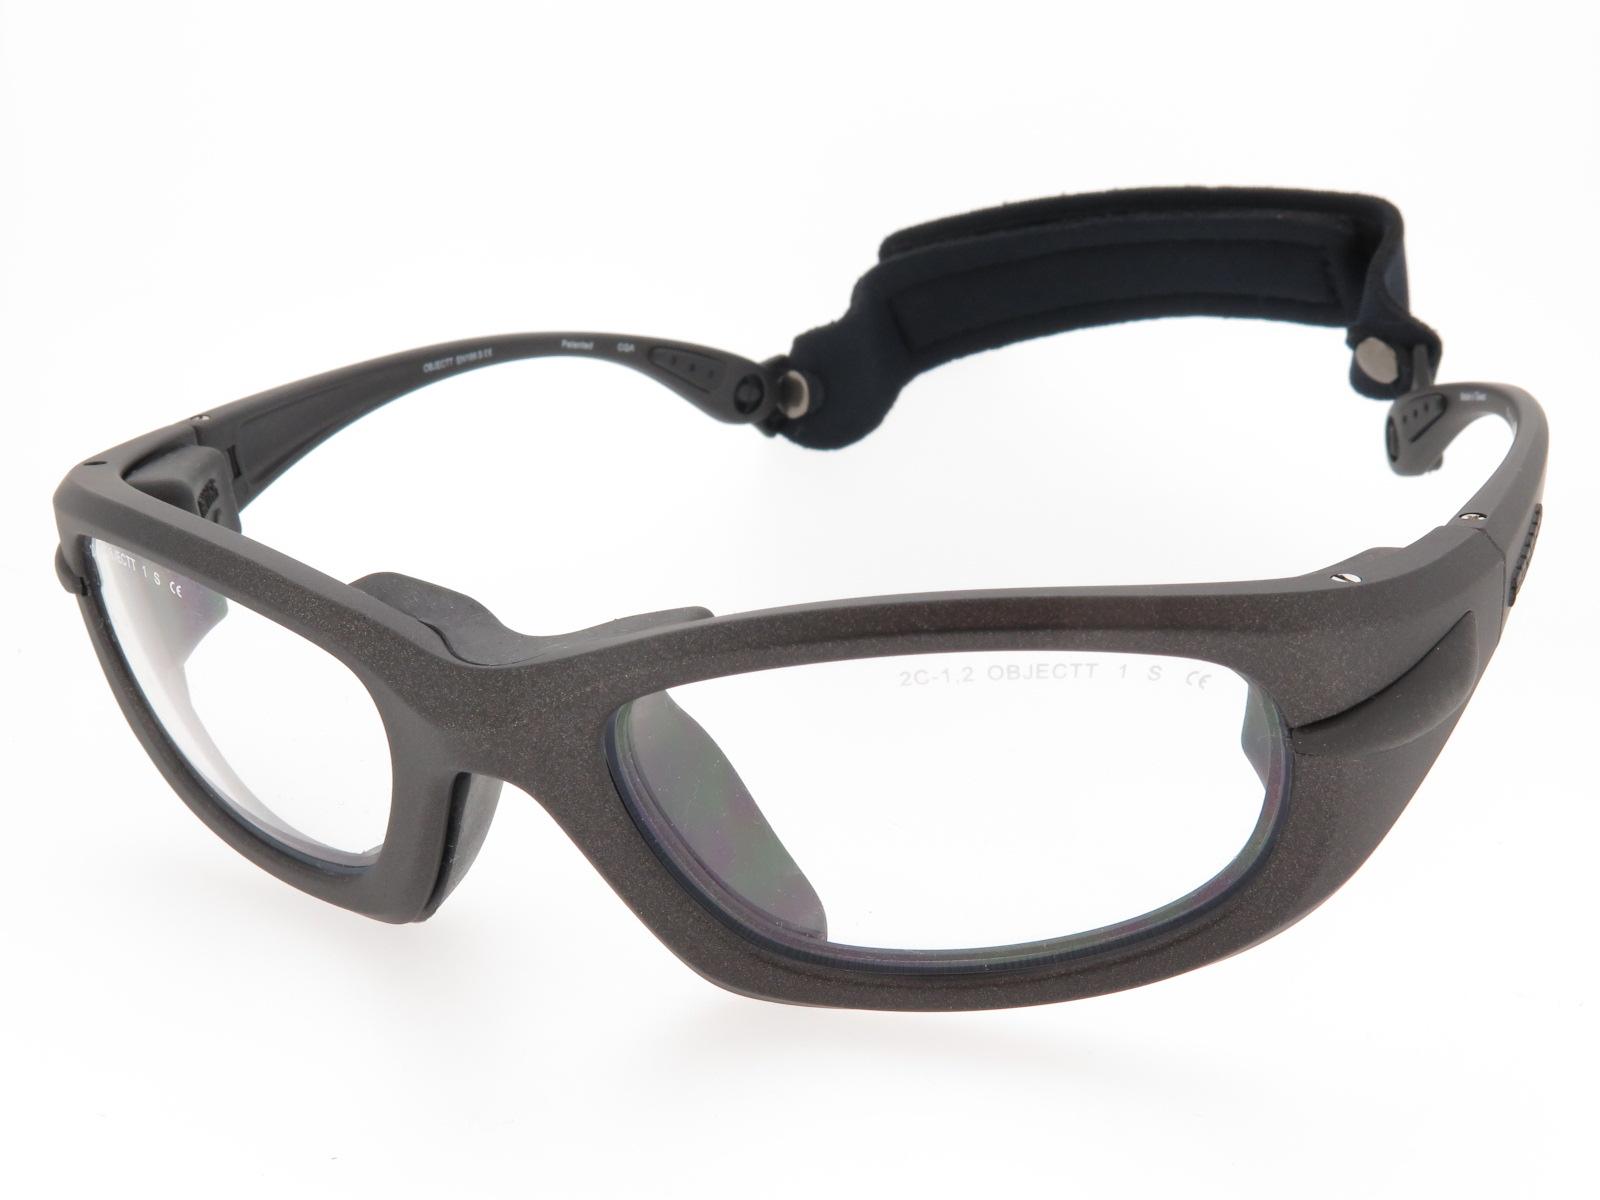 ProGear EyeGuard プロギアアイガード テンプル.ver スポーツ用 保護メガネ 大人用 XLサイズ EG-L1040 C8